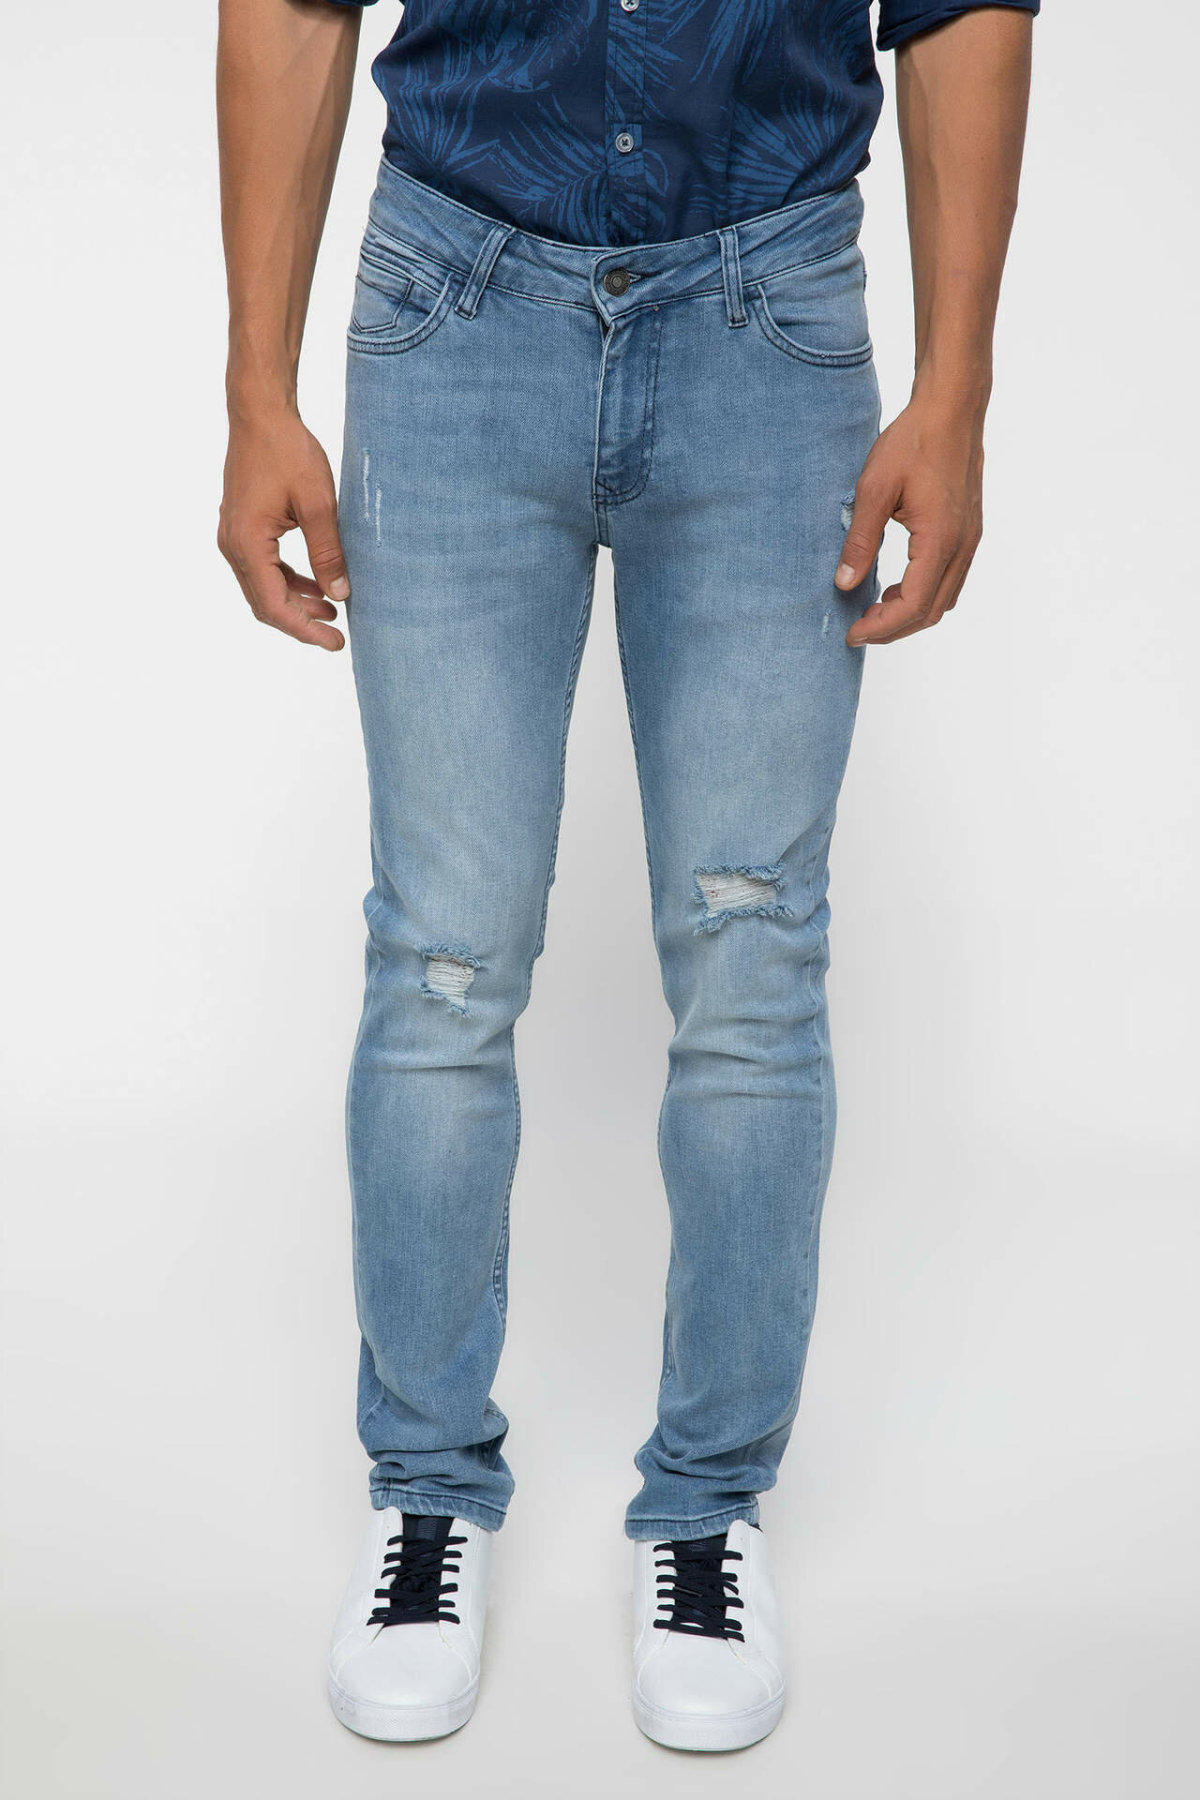 DeFacto Man Fashion Worn Blue Simple Trousers Jeans Casual Classic Denim Jeans Casual Loose Elasticity Pants Male -I7992AZ18HS